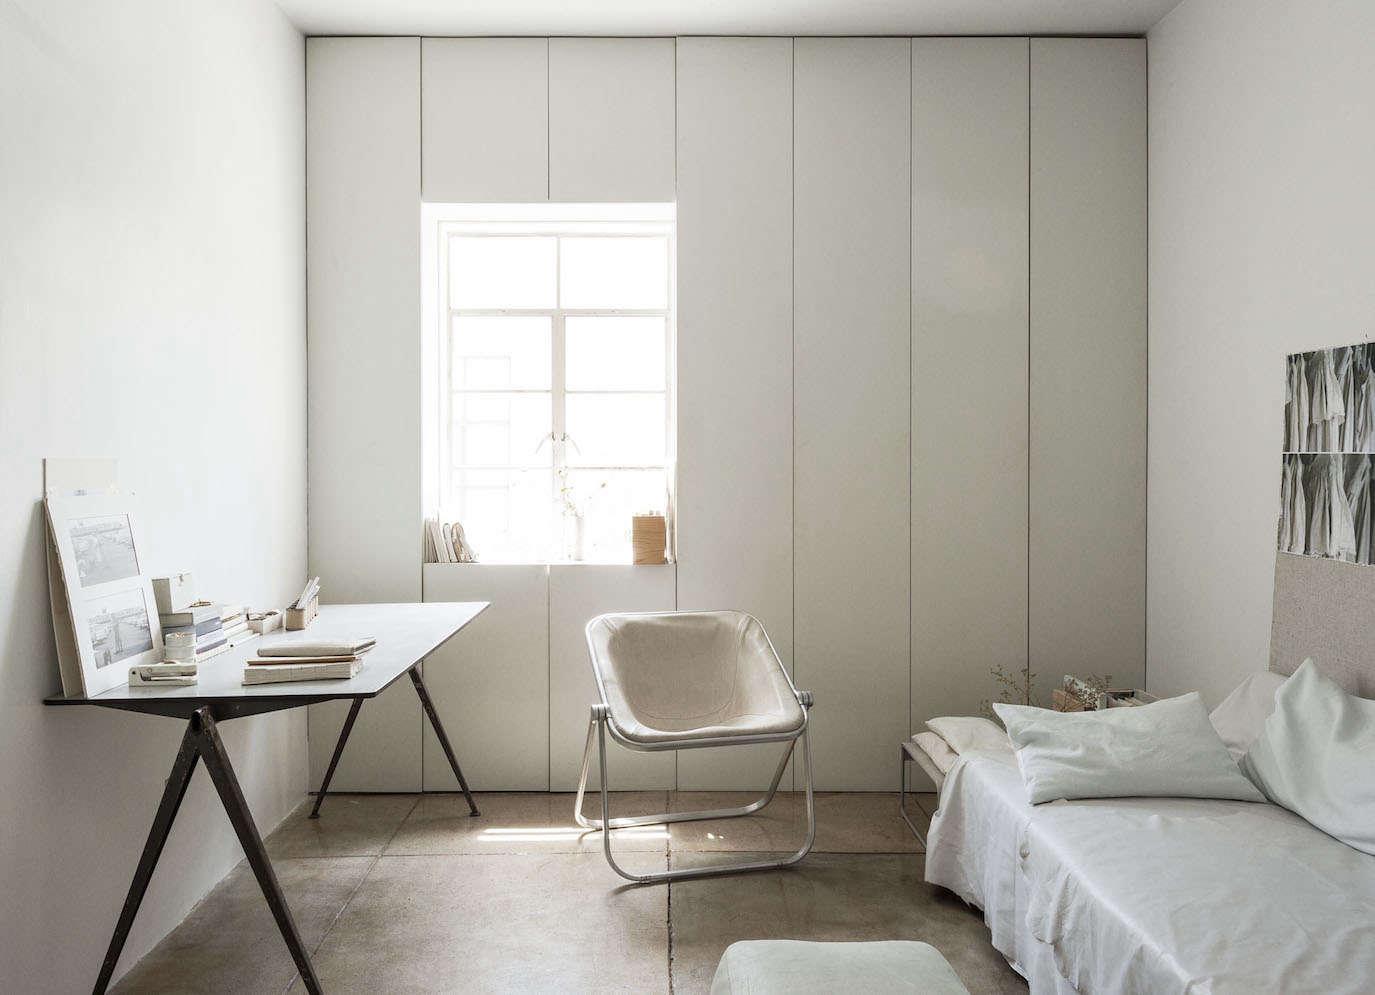 All white guest room in LA by Michaela Scherrer photo by Matthew Williams | Remodelista